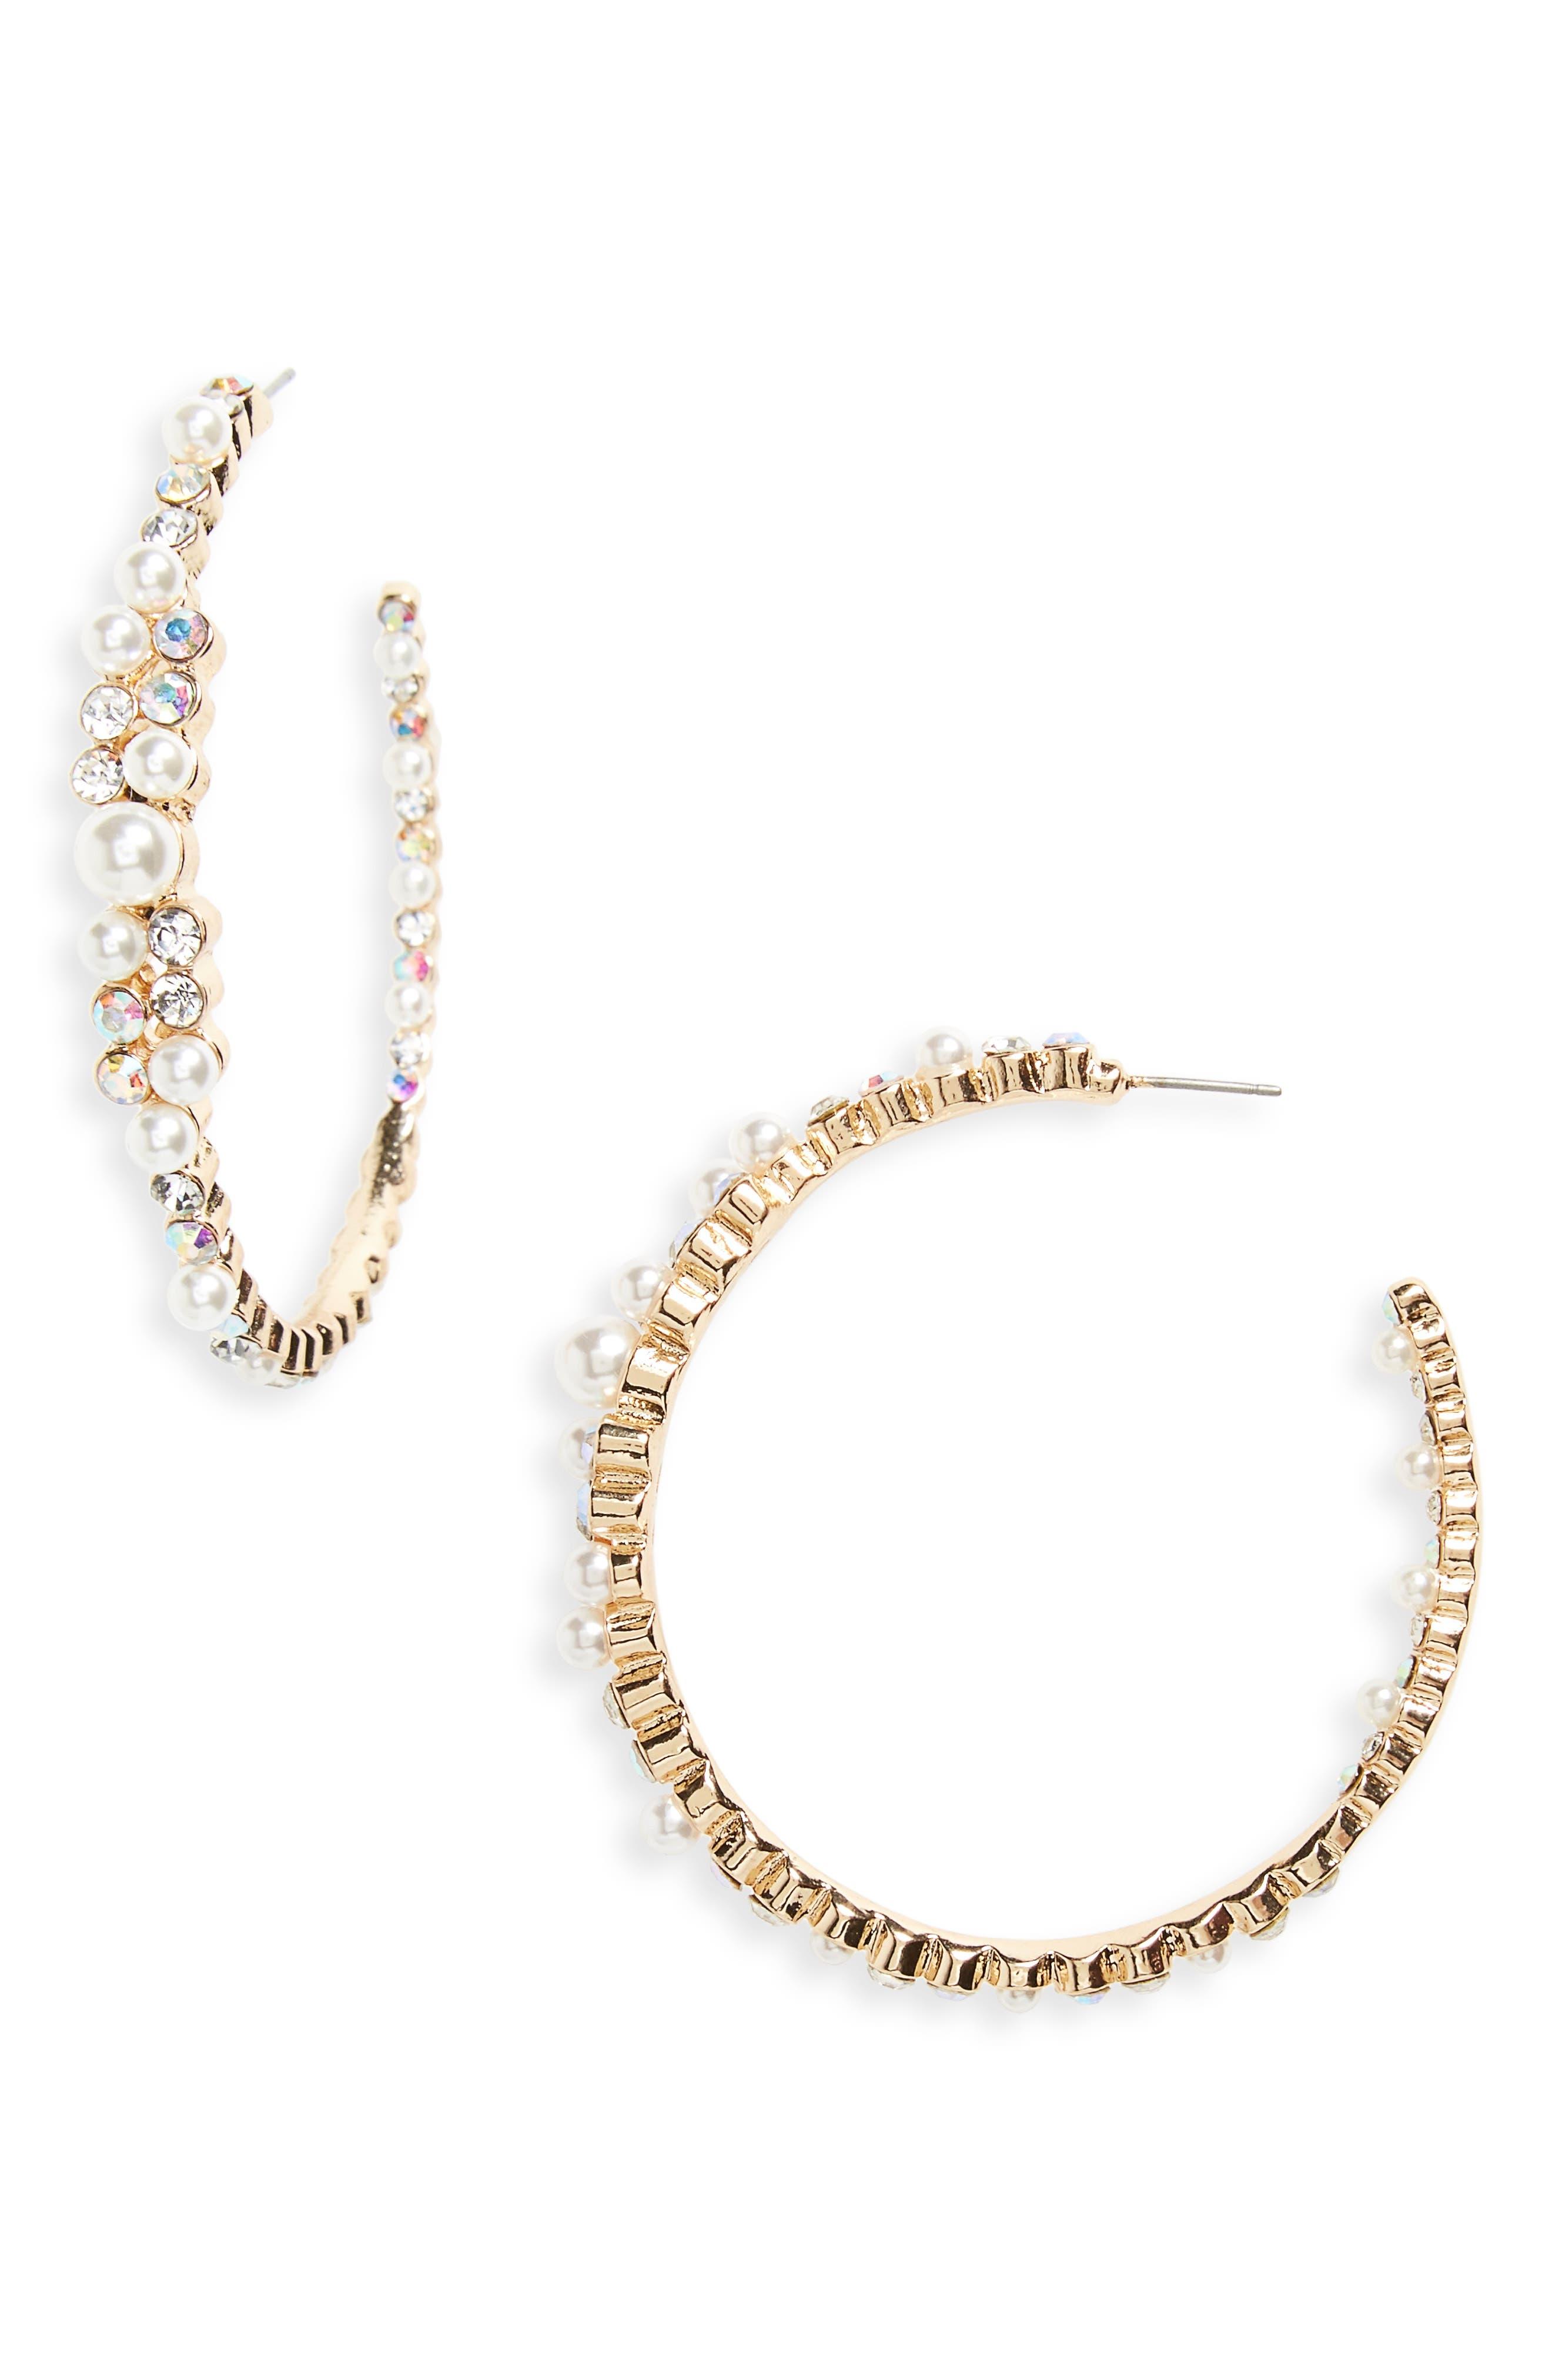 Imitation Pearl & Crystal Hoop Earrings,                         Main,                         color, Gold/ Pearl/ Crystal